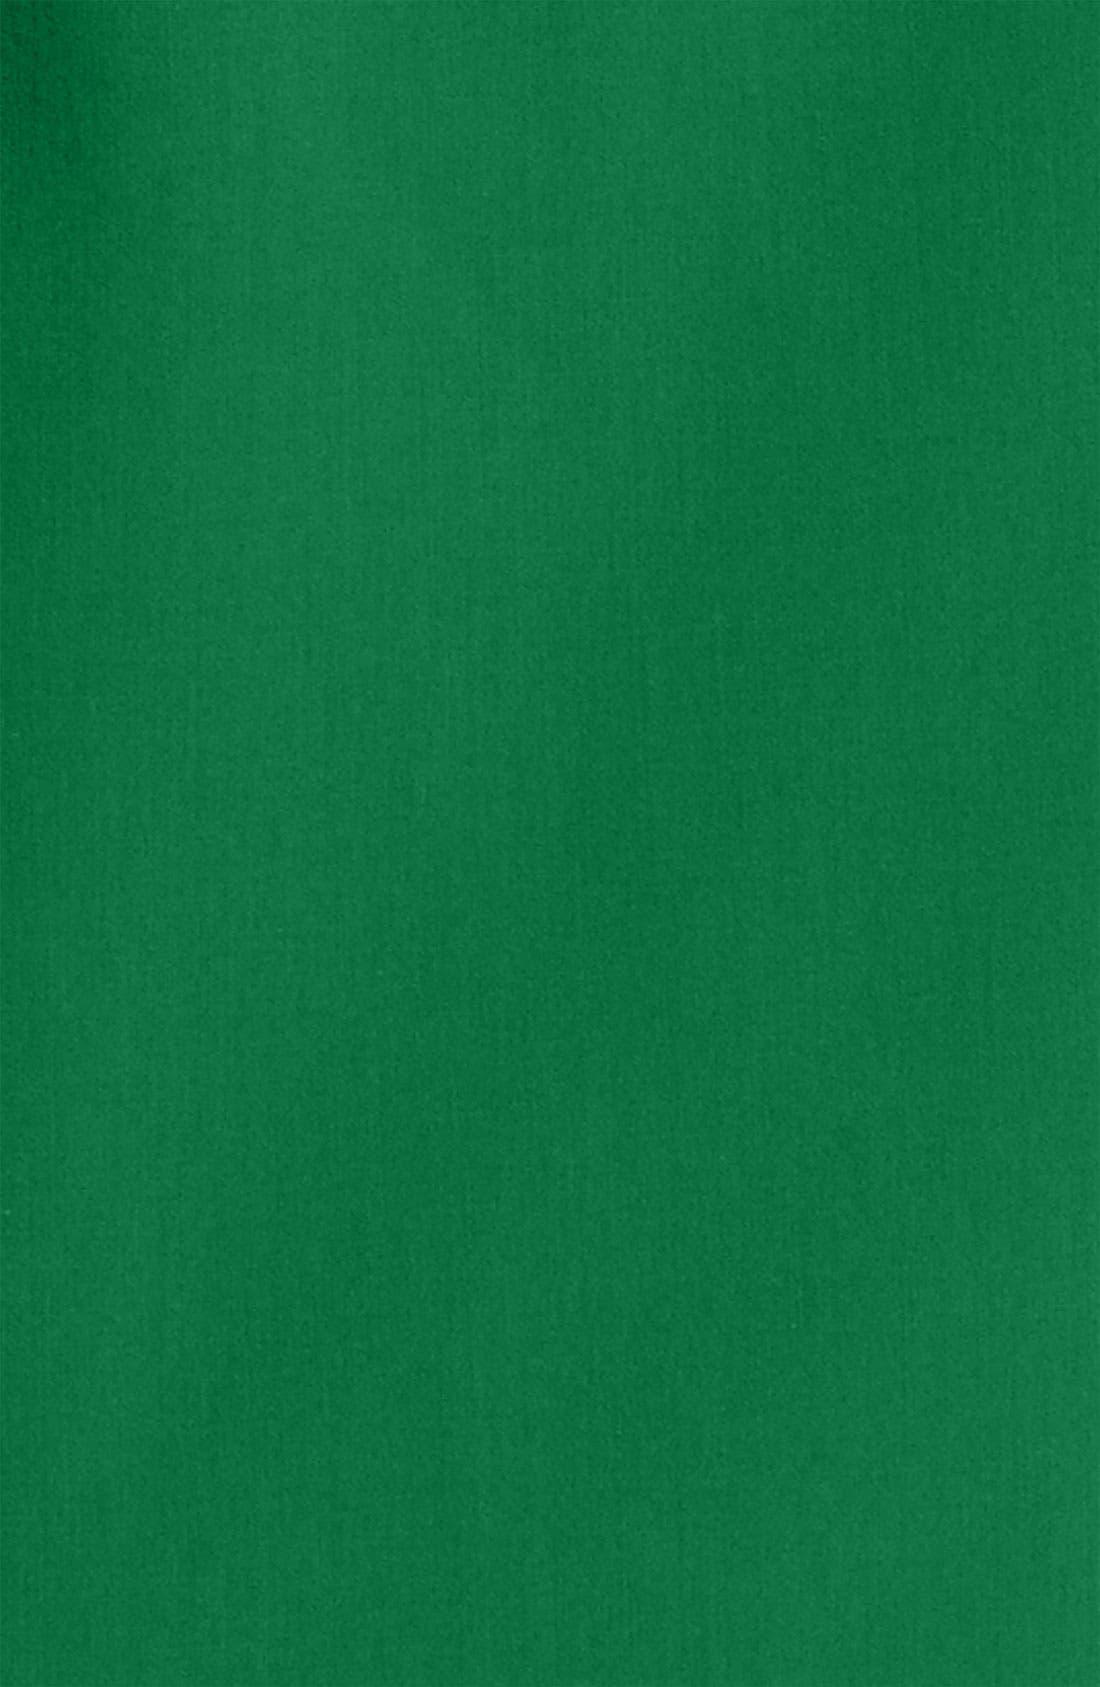 Alternate Image 3  - Michael Kors Double Face Stretch Wool Sheath